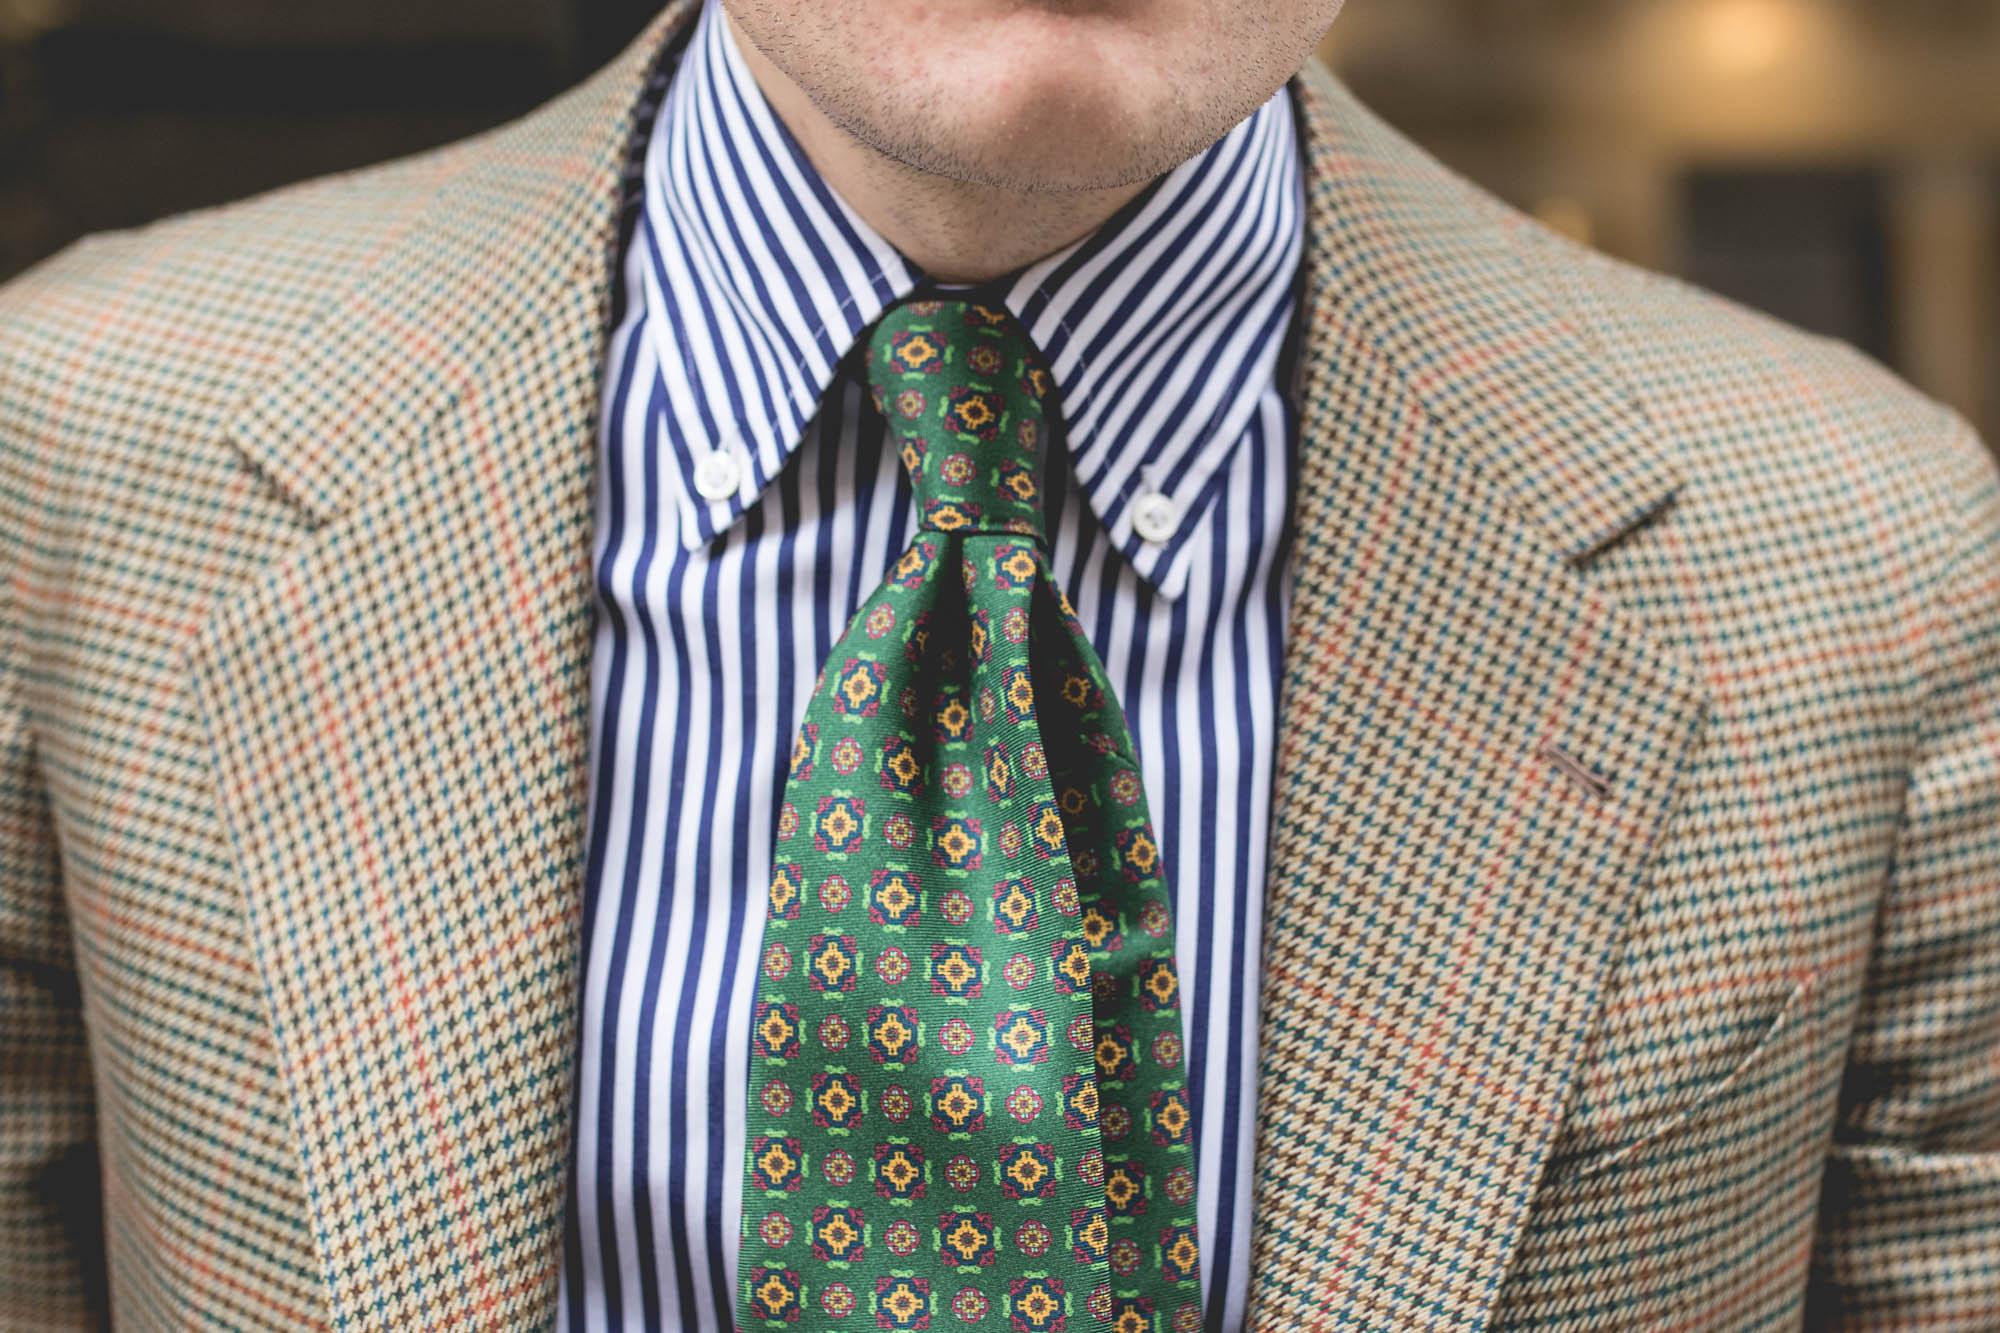 Gentlemen Clover - Les cravates